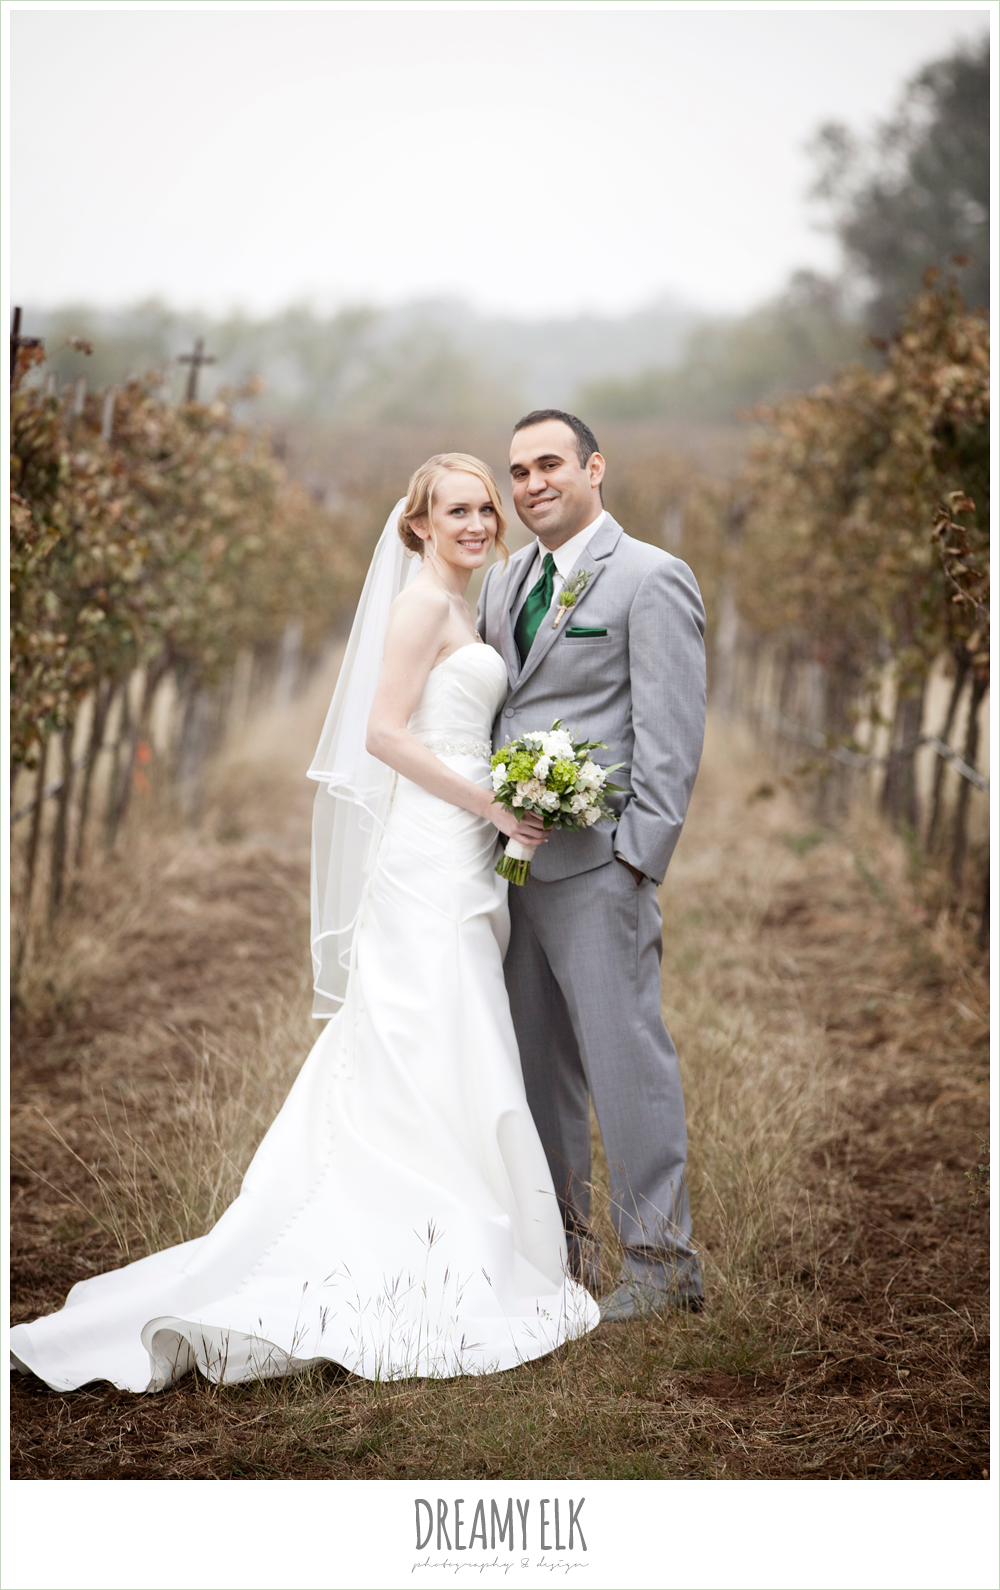 bride and groom, winter vineyard wedding, dreamy elk photography and design